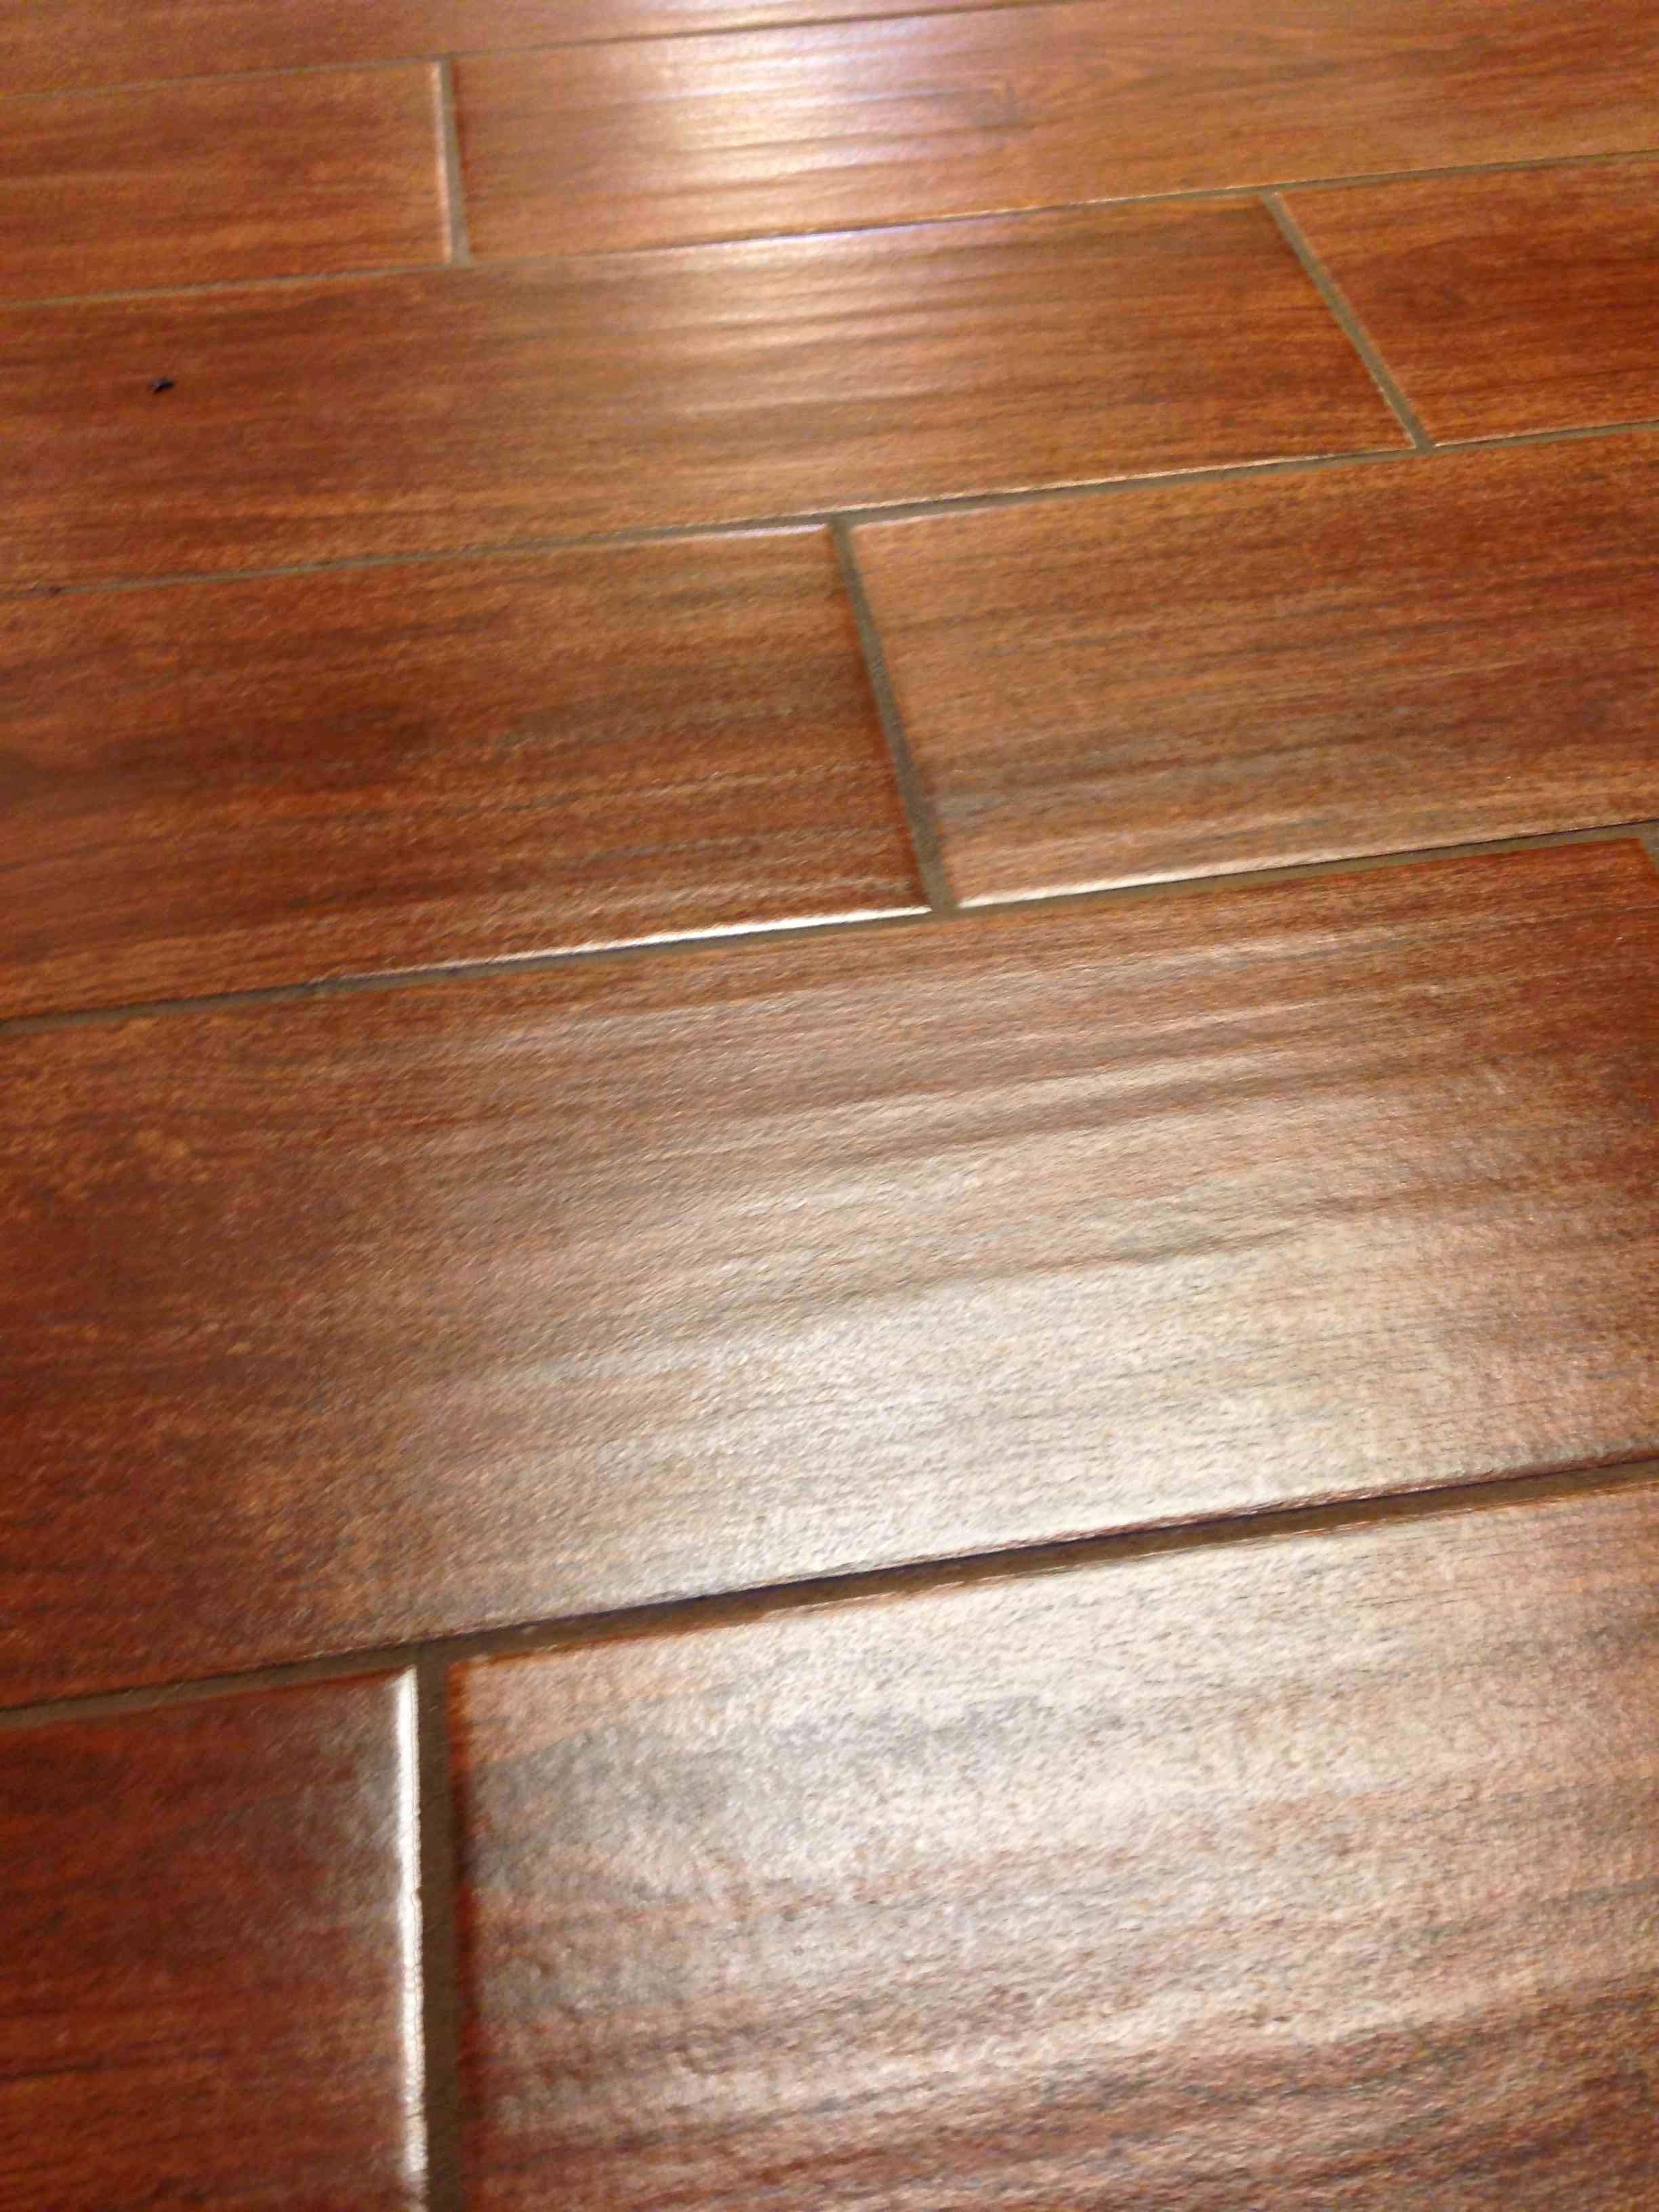 3 8 unfinished hardwood flooring of 19 new cheapest hardwood flooring photograph dizpos com throughout cheapest hardwood flooring awesome wholesale hardwood flooring nj where to buy hardwood flooring stock of 19